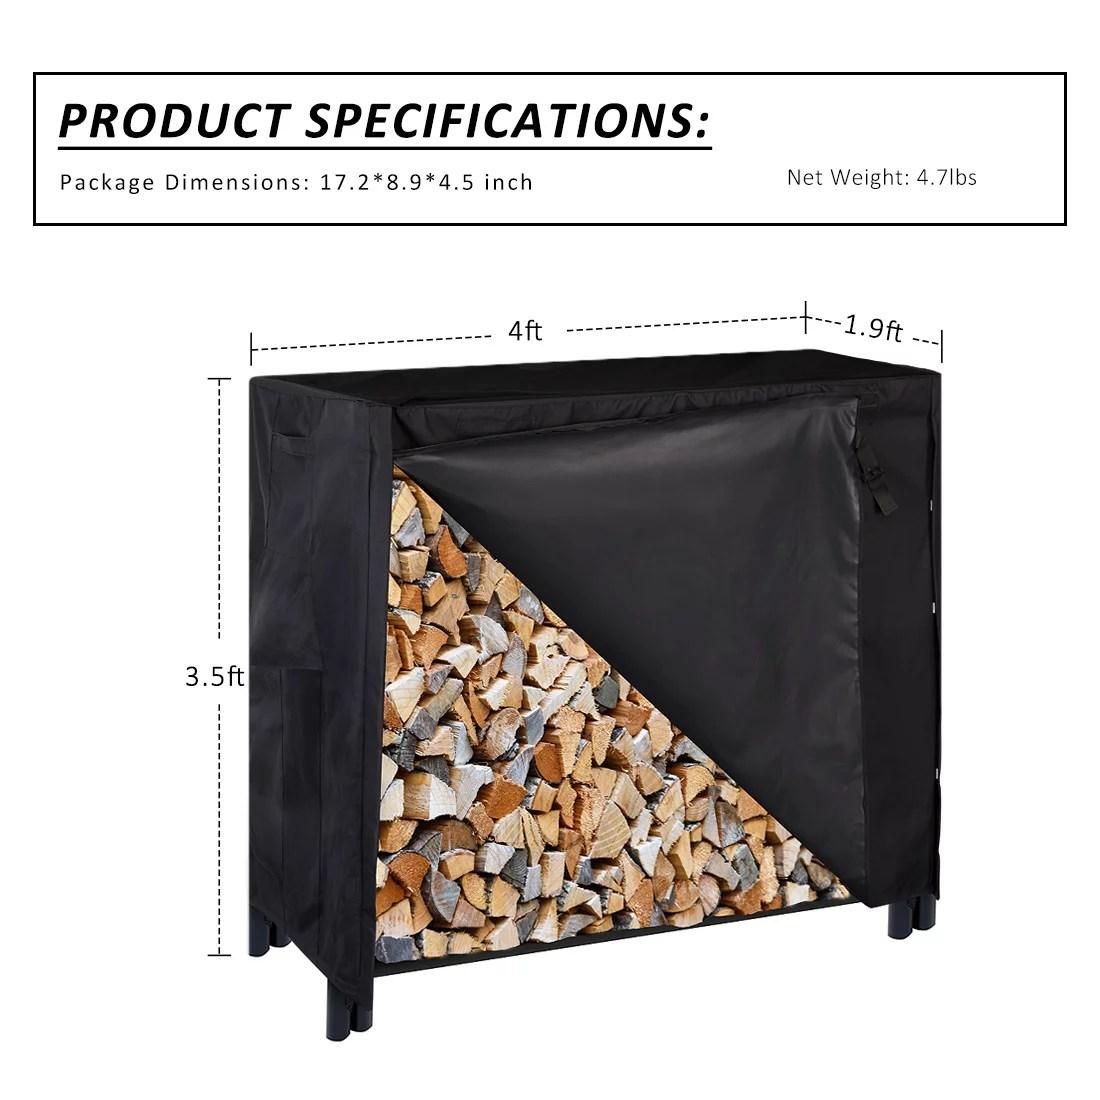 heavy duty waterproof outdoor firewood storage log rack cover with zipper 4 feet walmart com